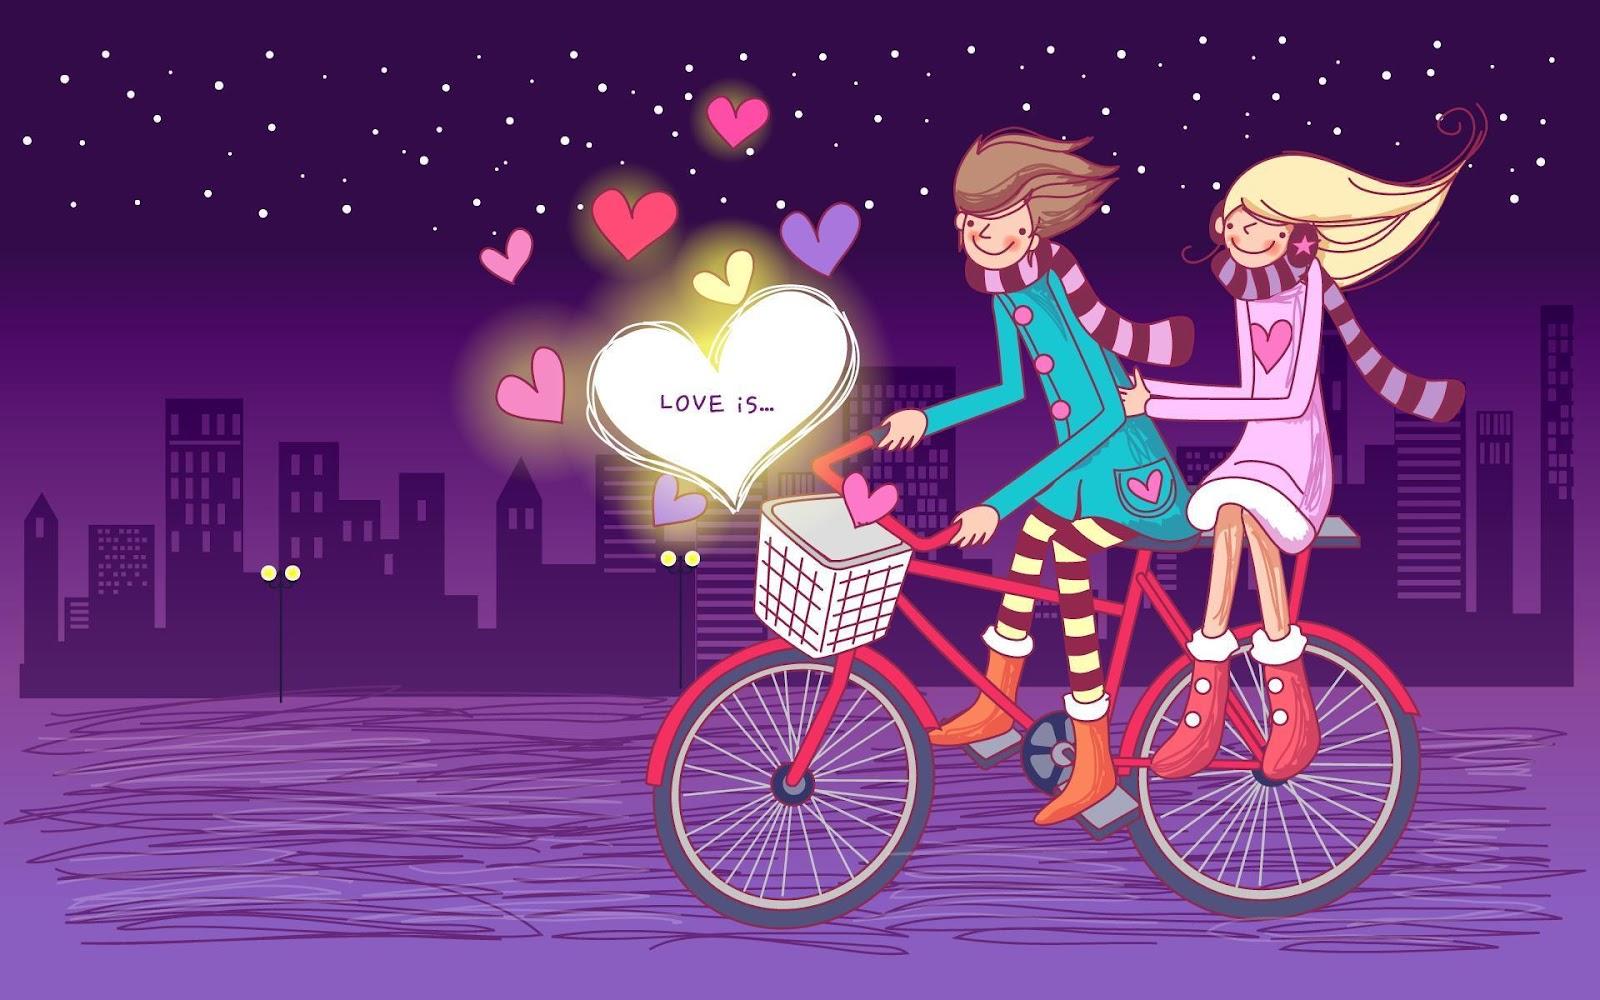 Fondos De Imagenes De Amor - imagenes animadas para celular bajarimagenesdeamor